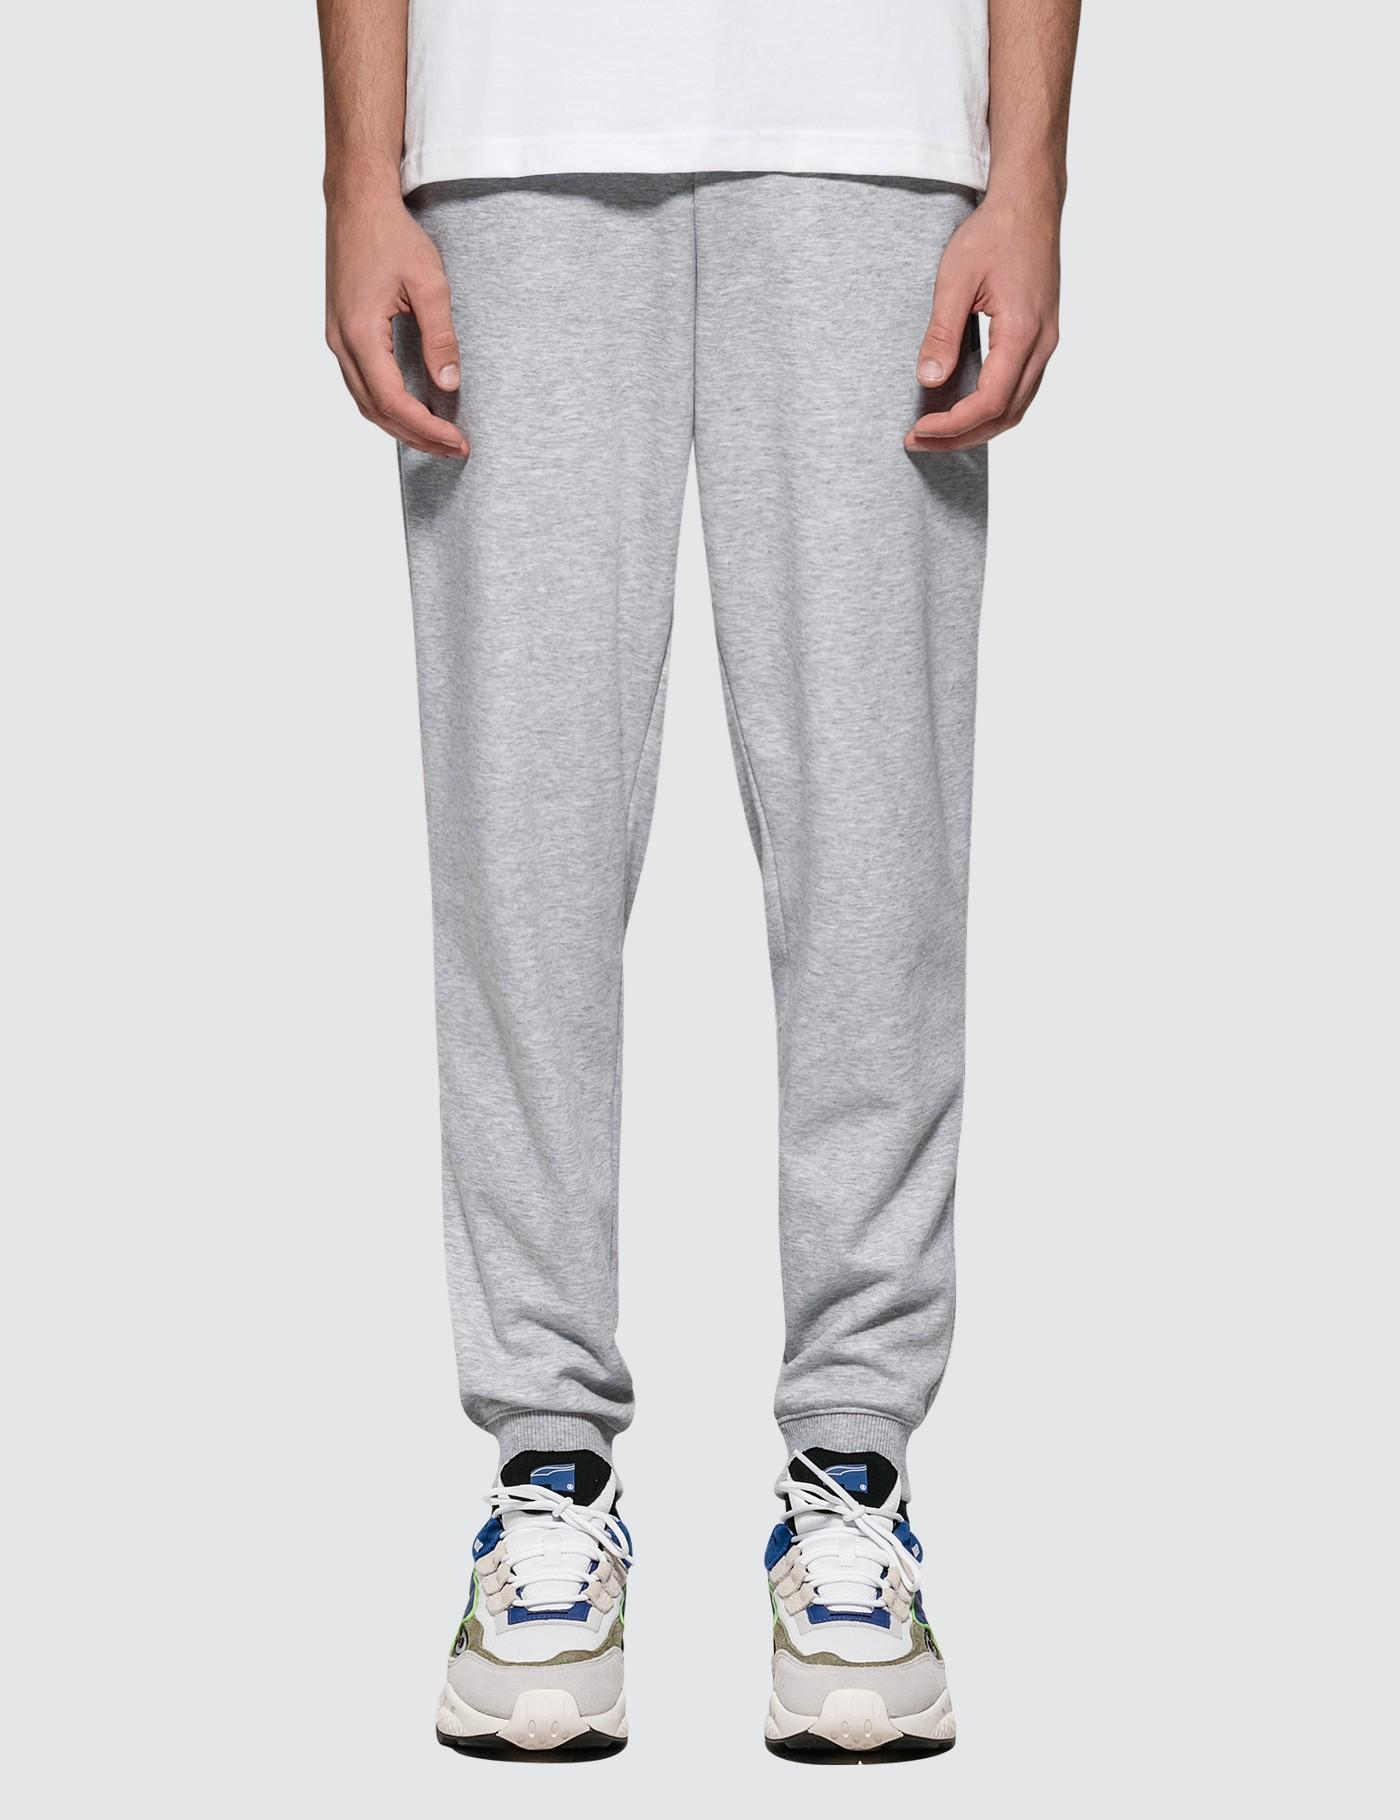 831c6c0b3e3b Lyst - PUMA Ader Error X Sweat Pants in Gray for Men